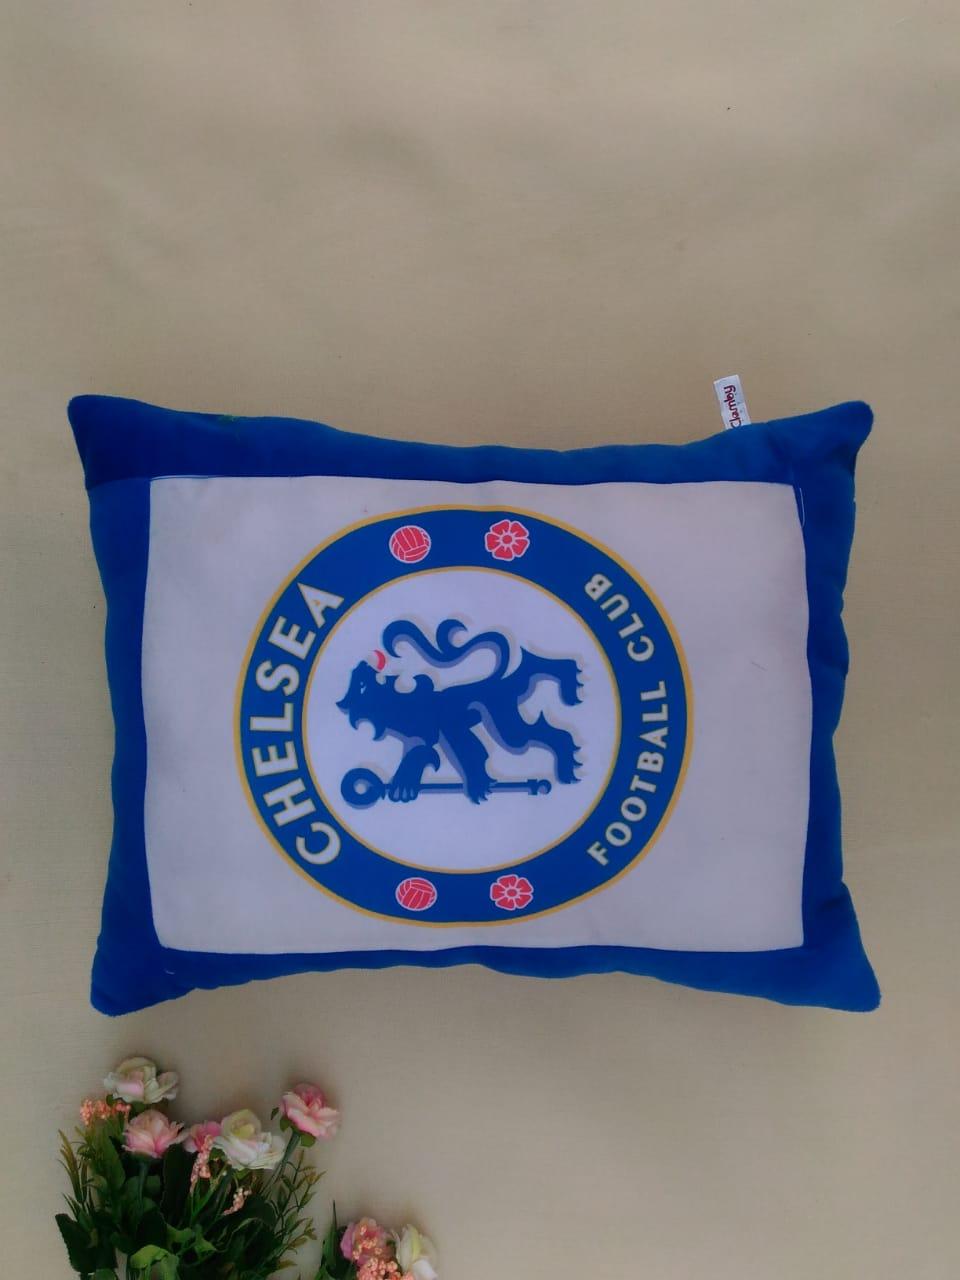 Bantal Print Souvenir Chelsea Football Club